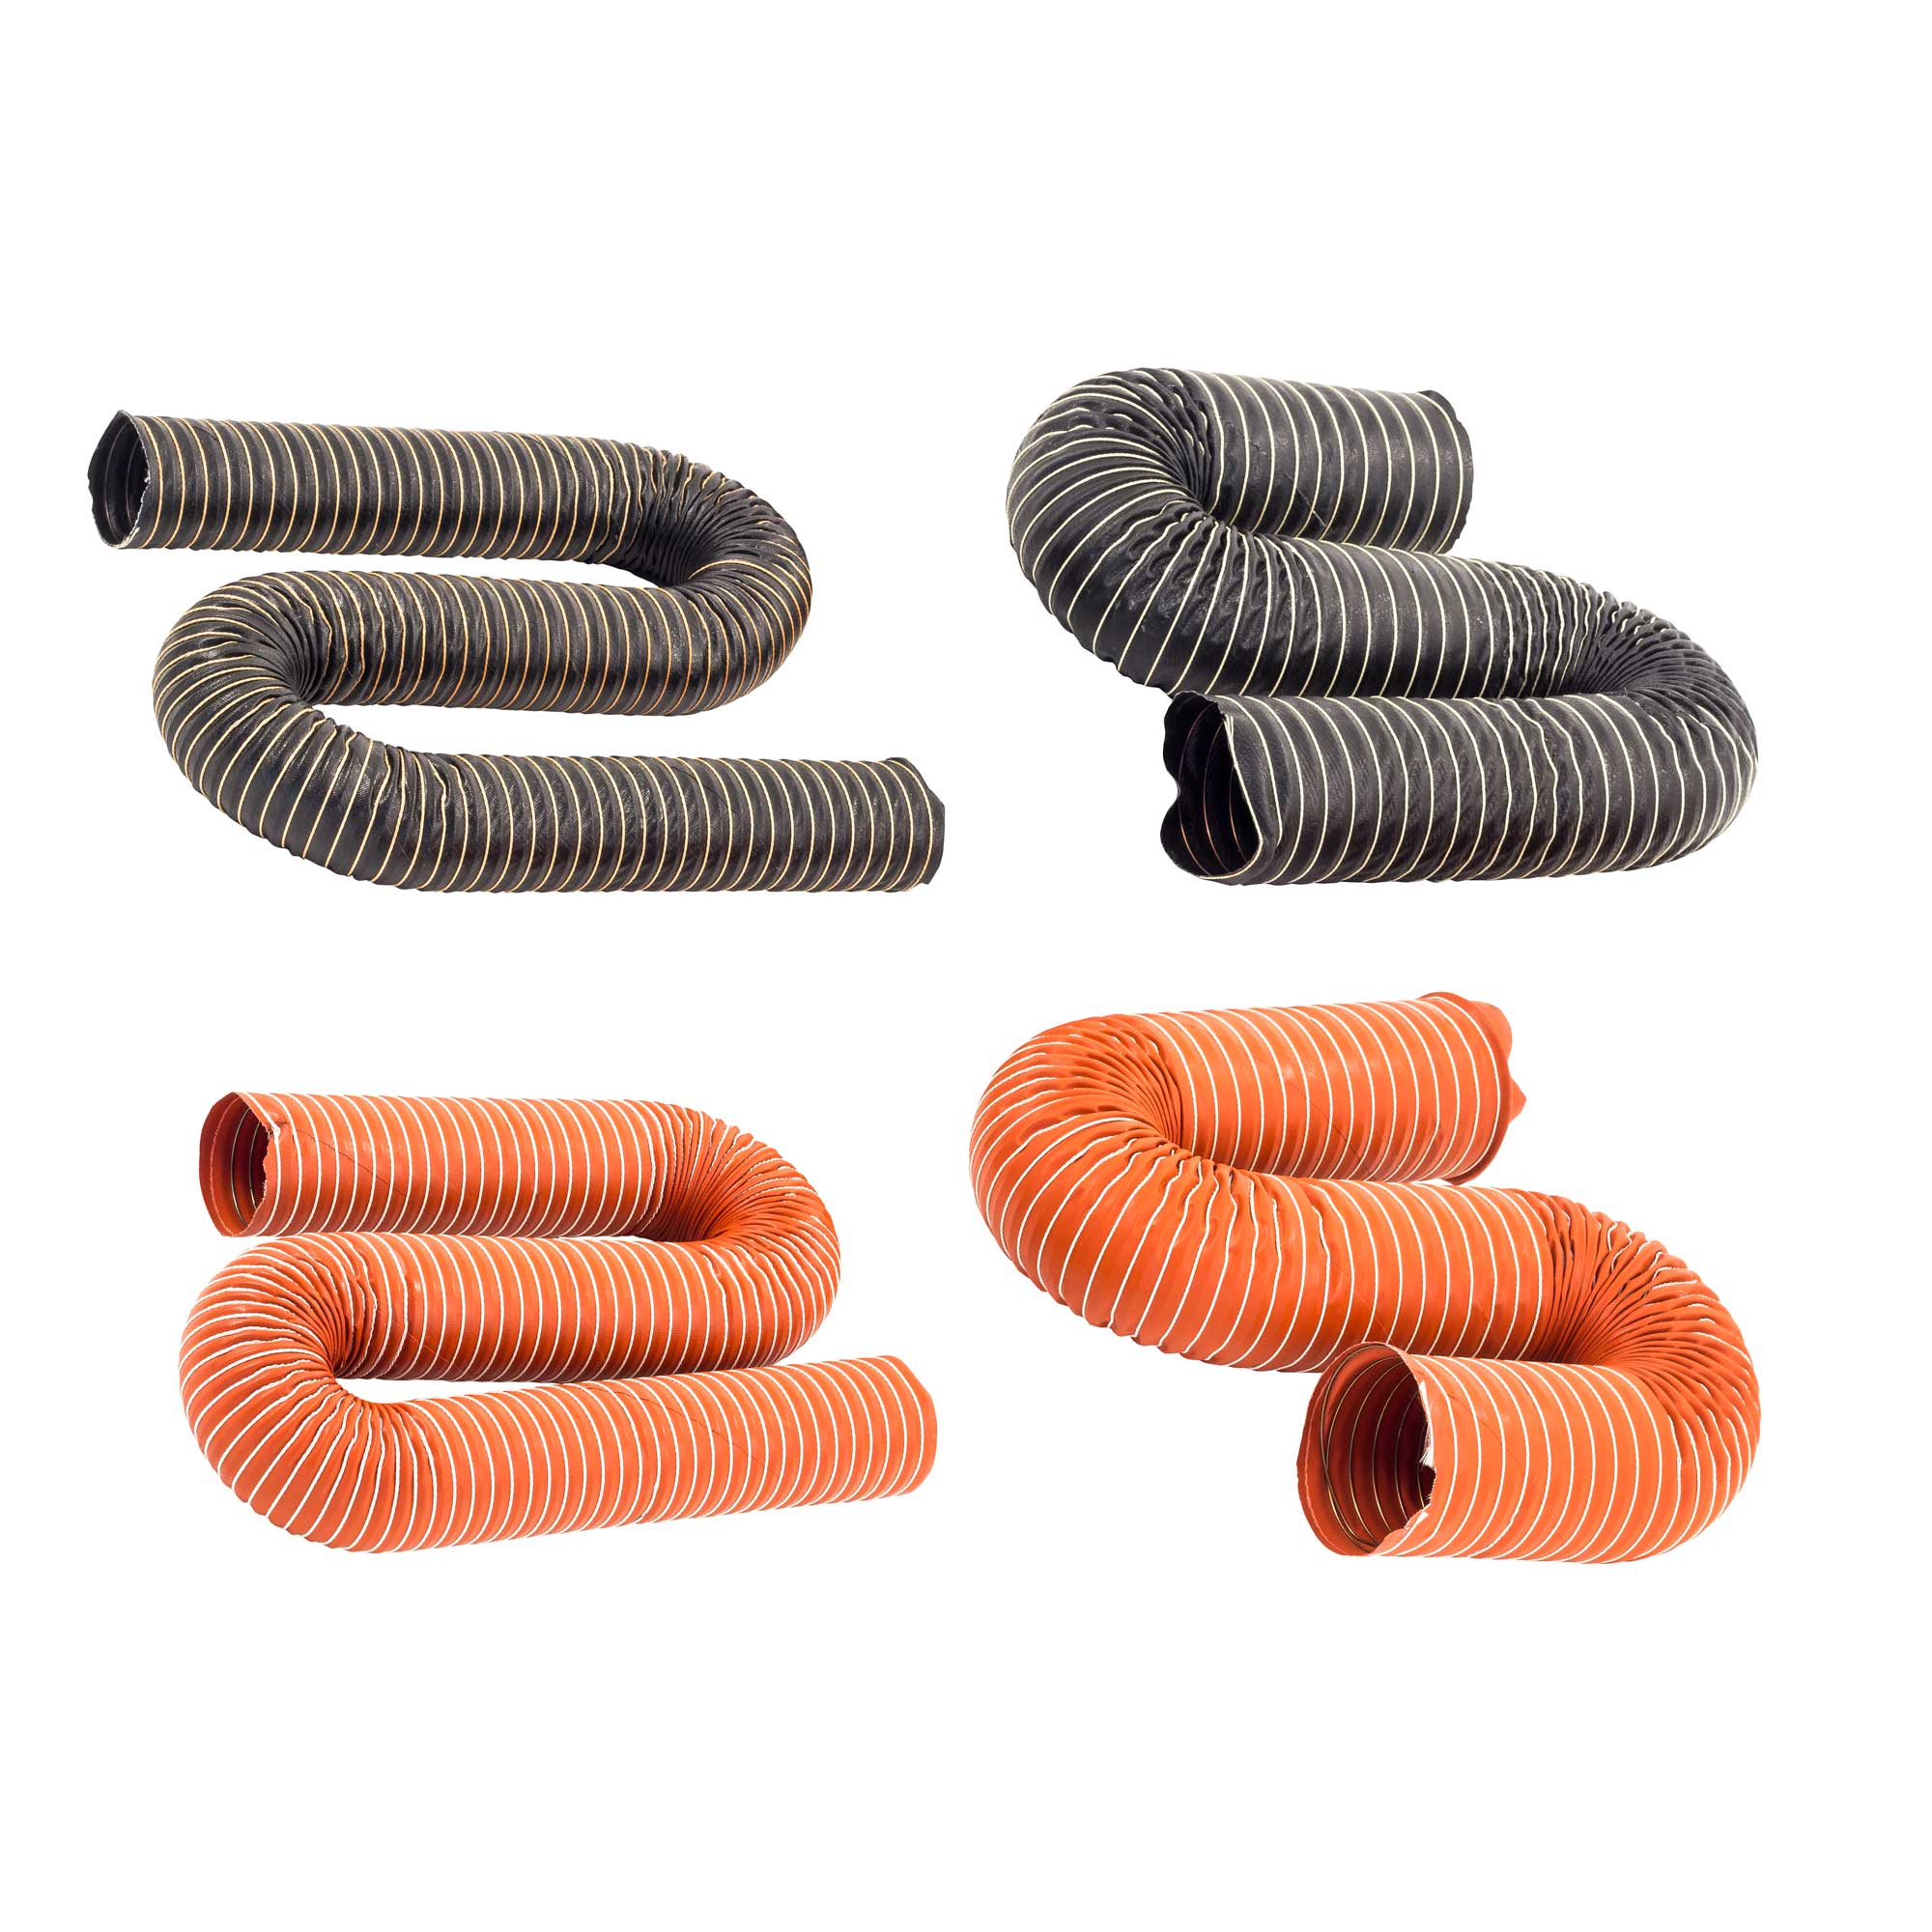 JJC Single Layer Flexible Brake//Air Neoprene Ducting Hose 25mm Bore 1 Metre